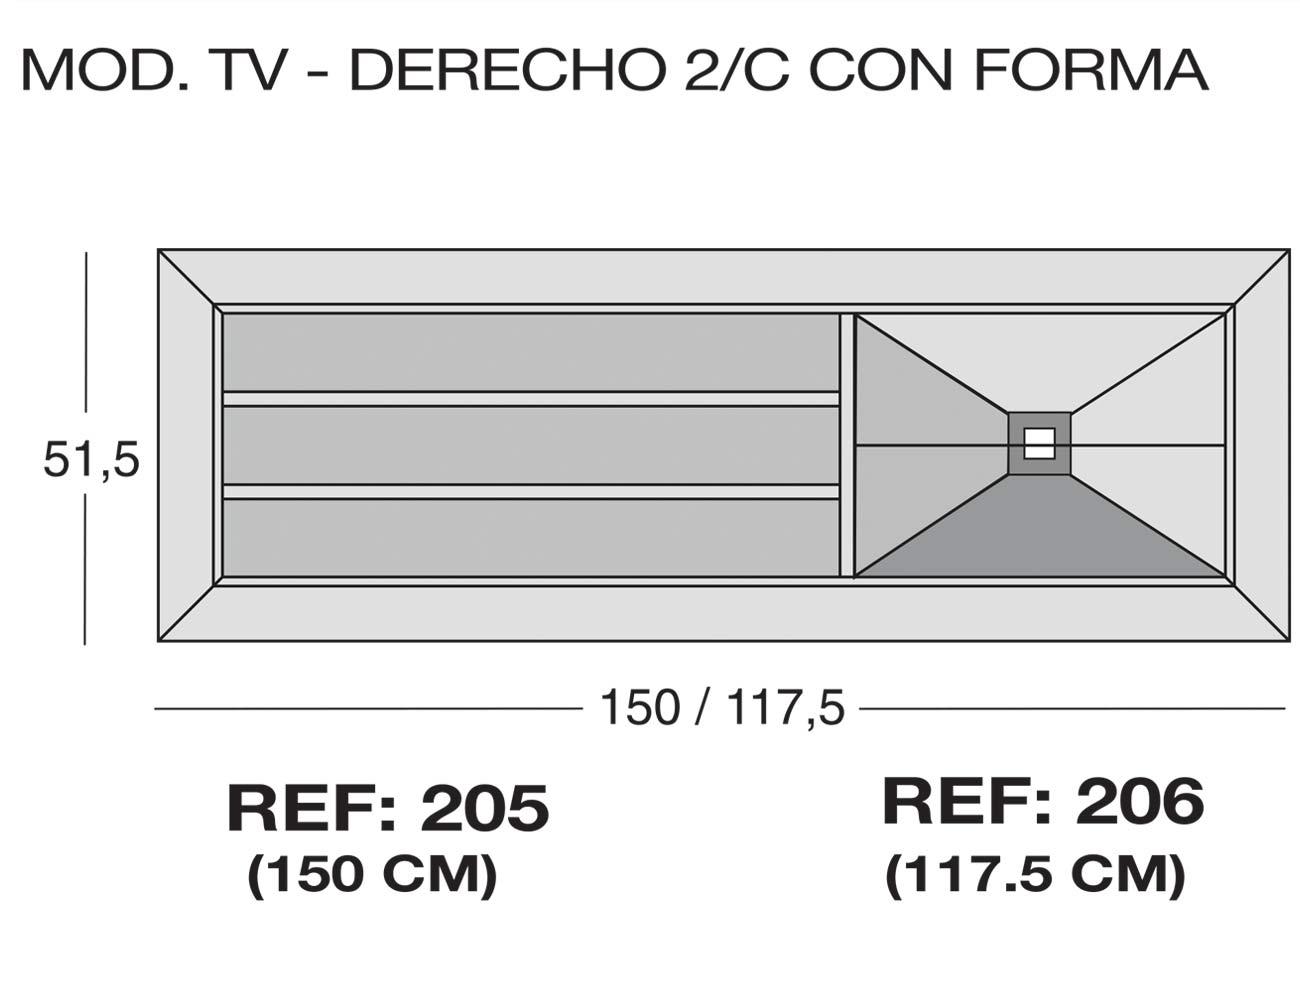 Modulo tv derecho 2 c forma 205 206